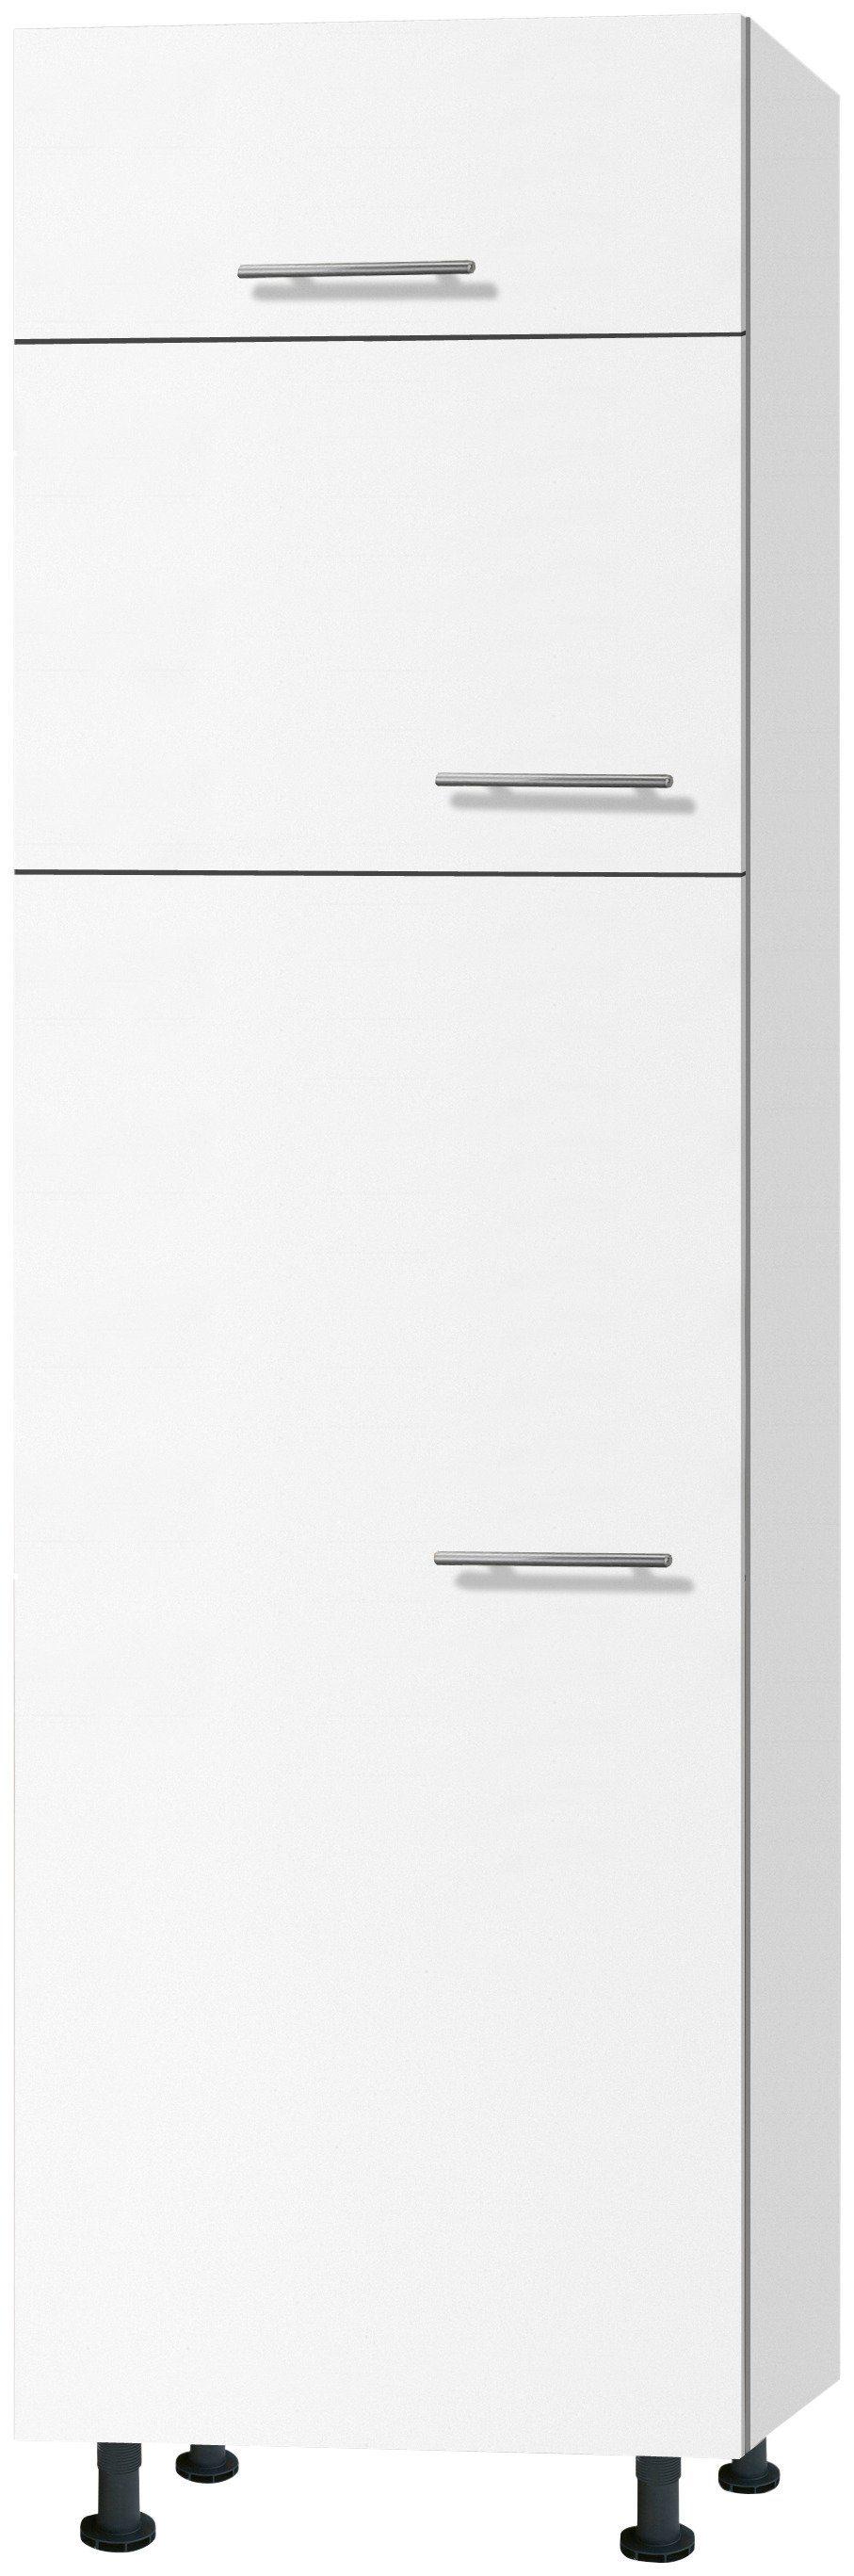 Kühl-Gefrierkombination »Michel«, Höhe 211,8 cm